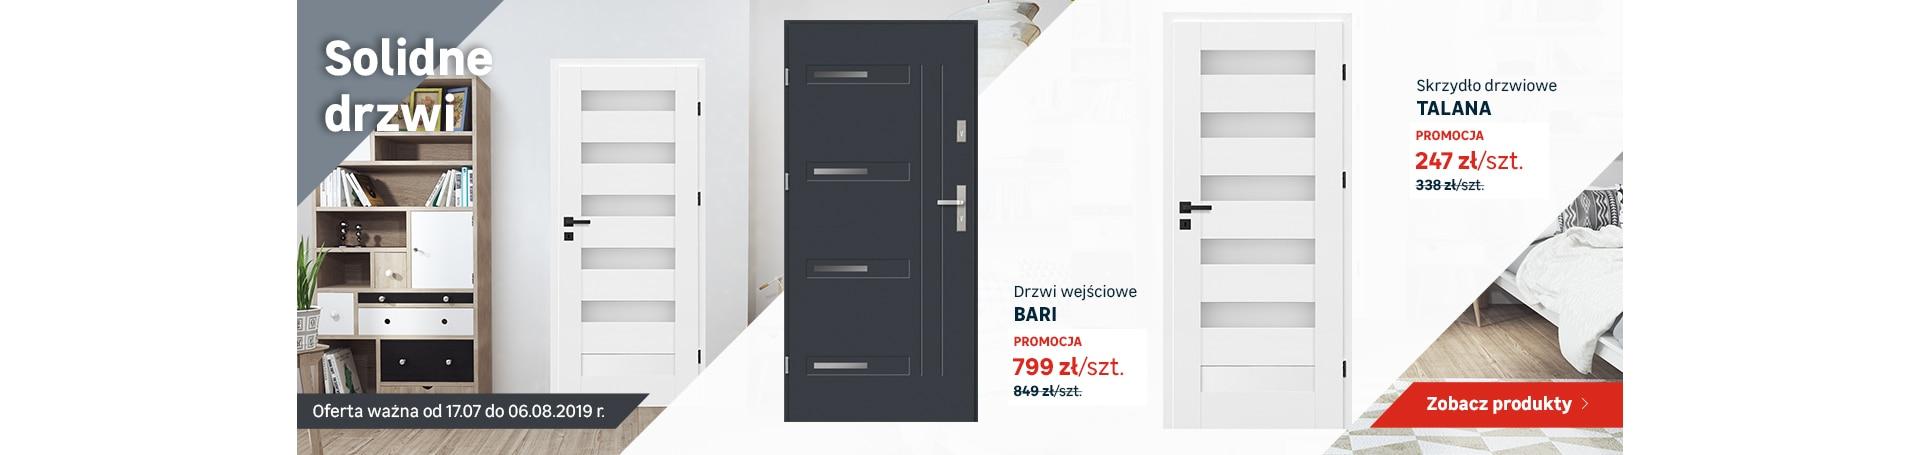 rr-drzwi-1323x455-23.07-6.08.2019